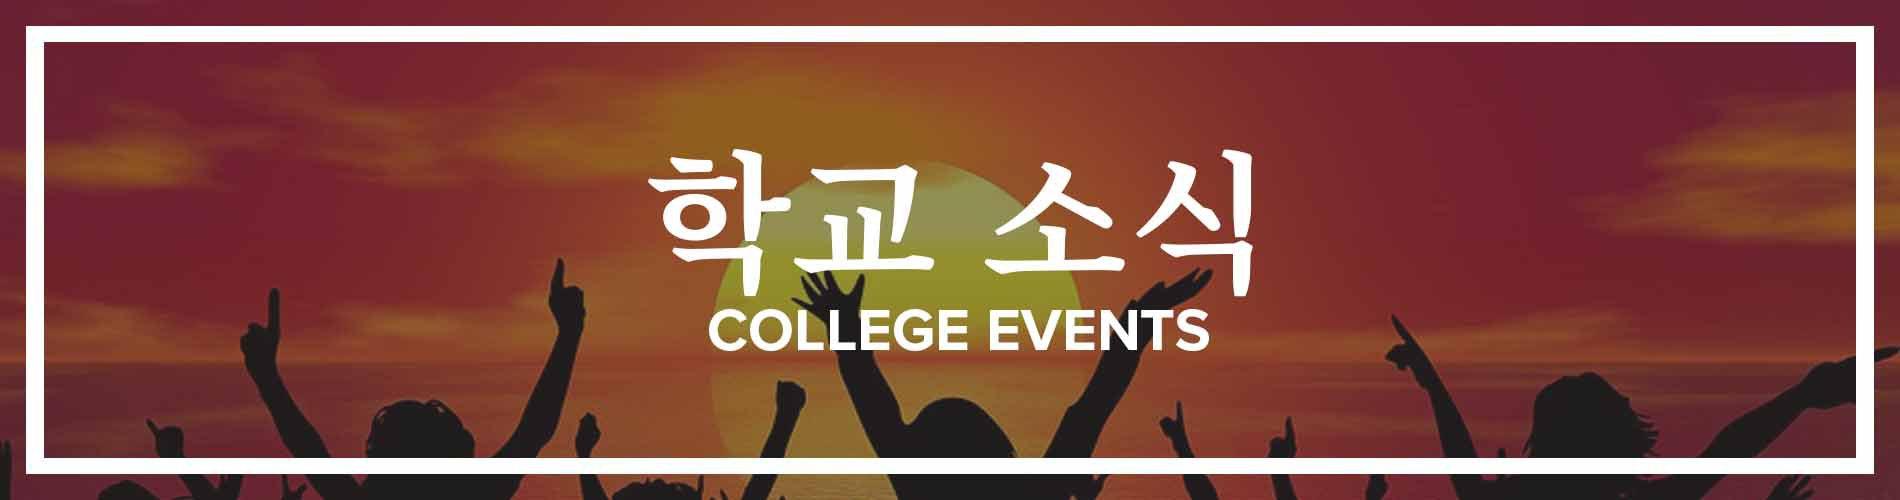 College Events - Korean Banner